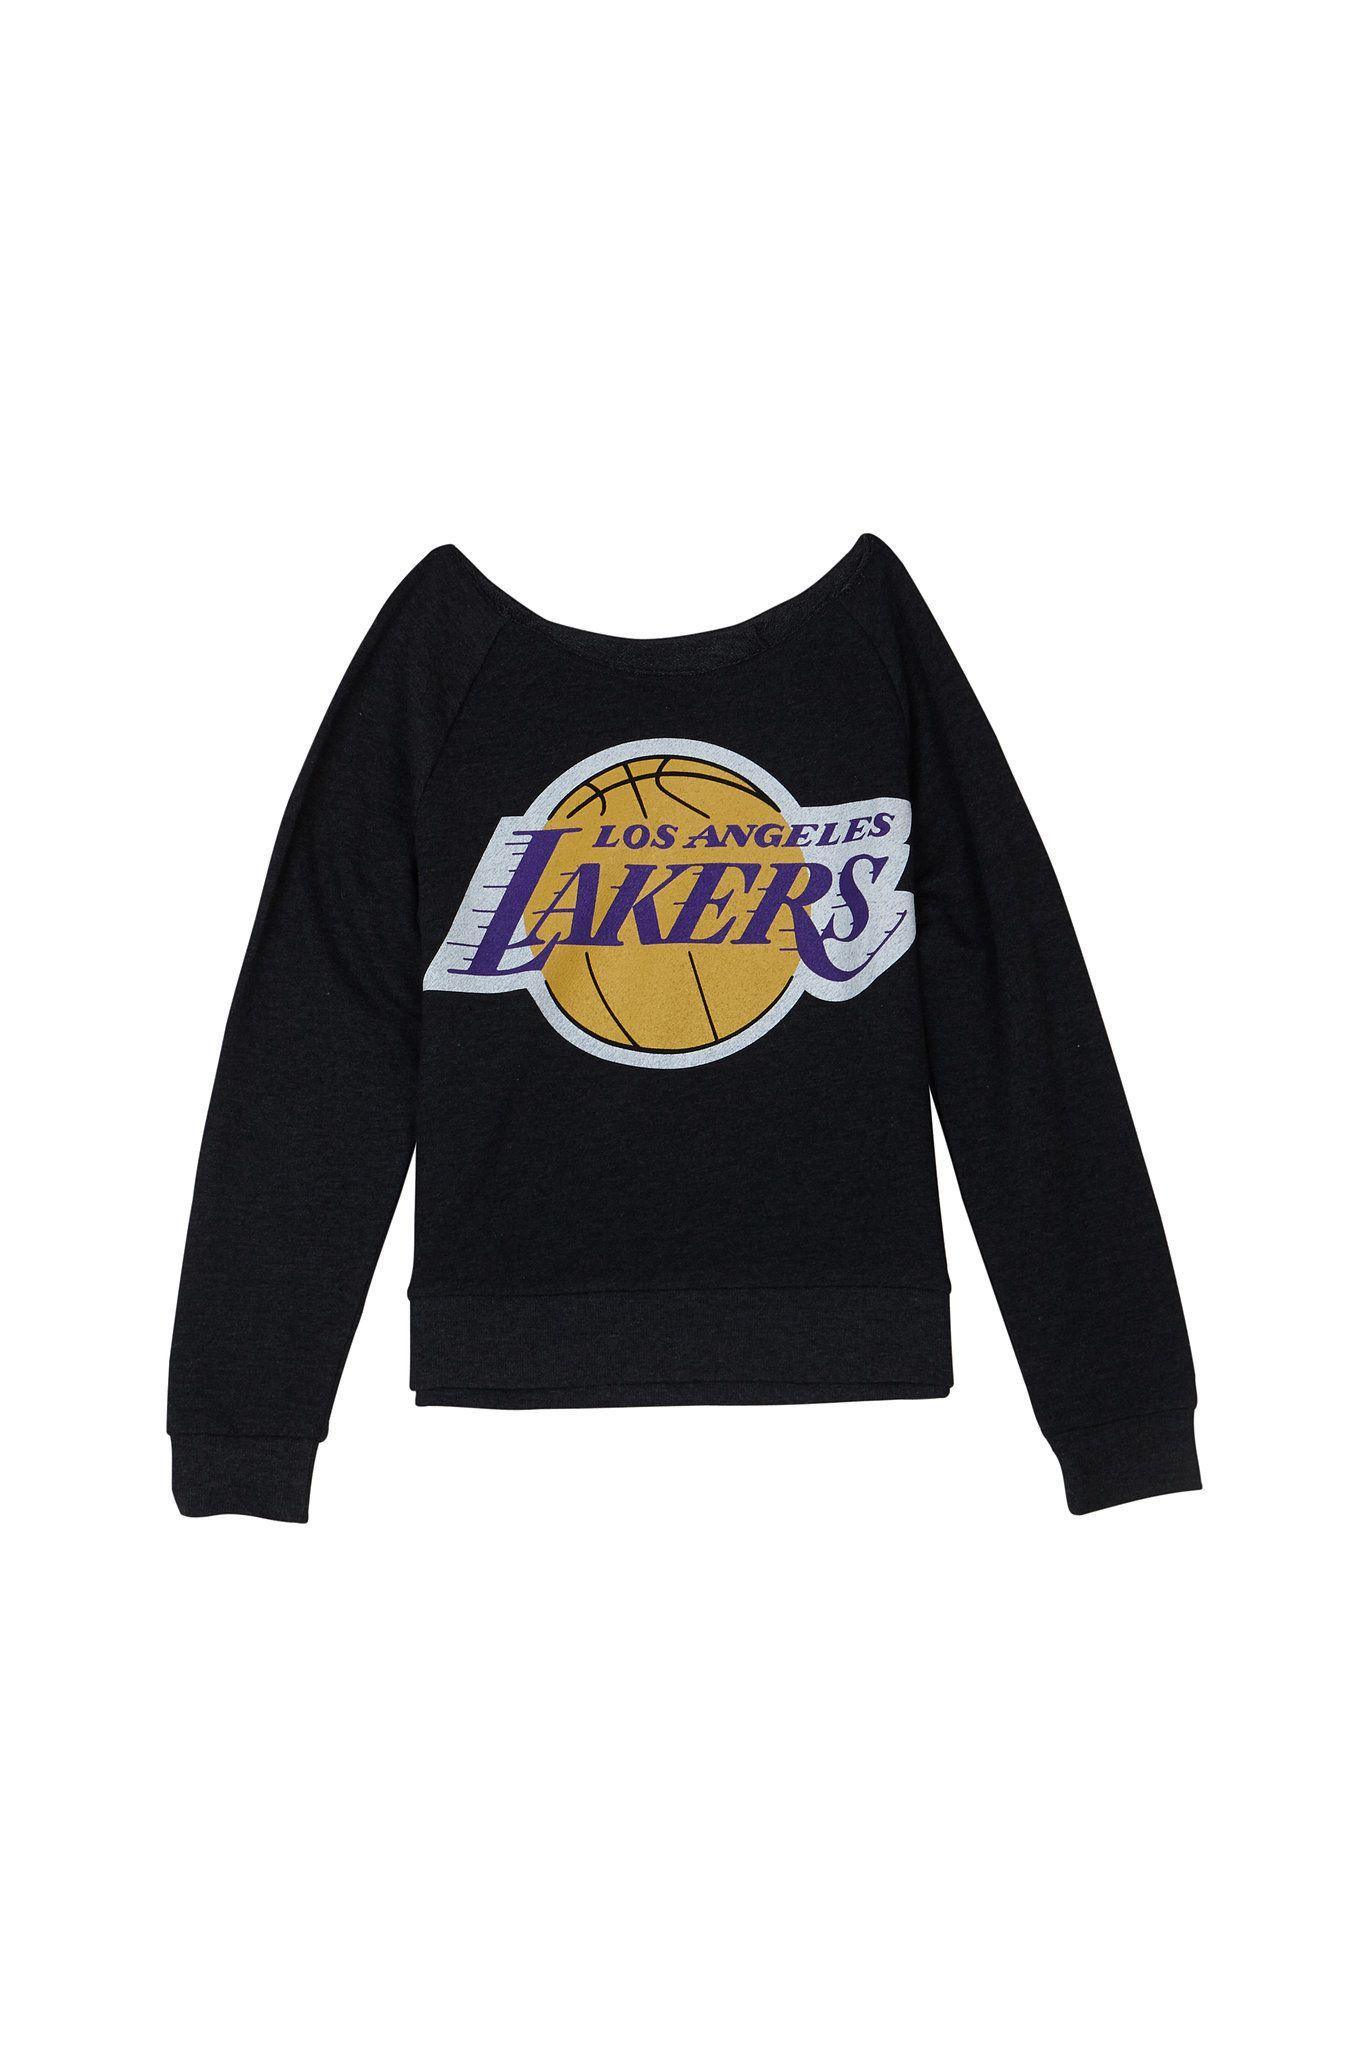 Forever 21 X Nba Lakers Sweatshirt